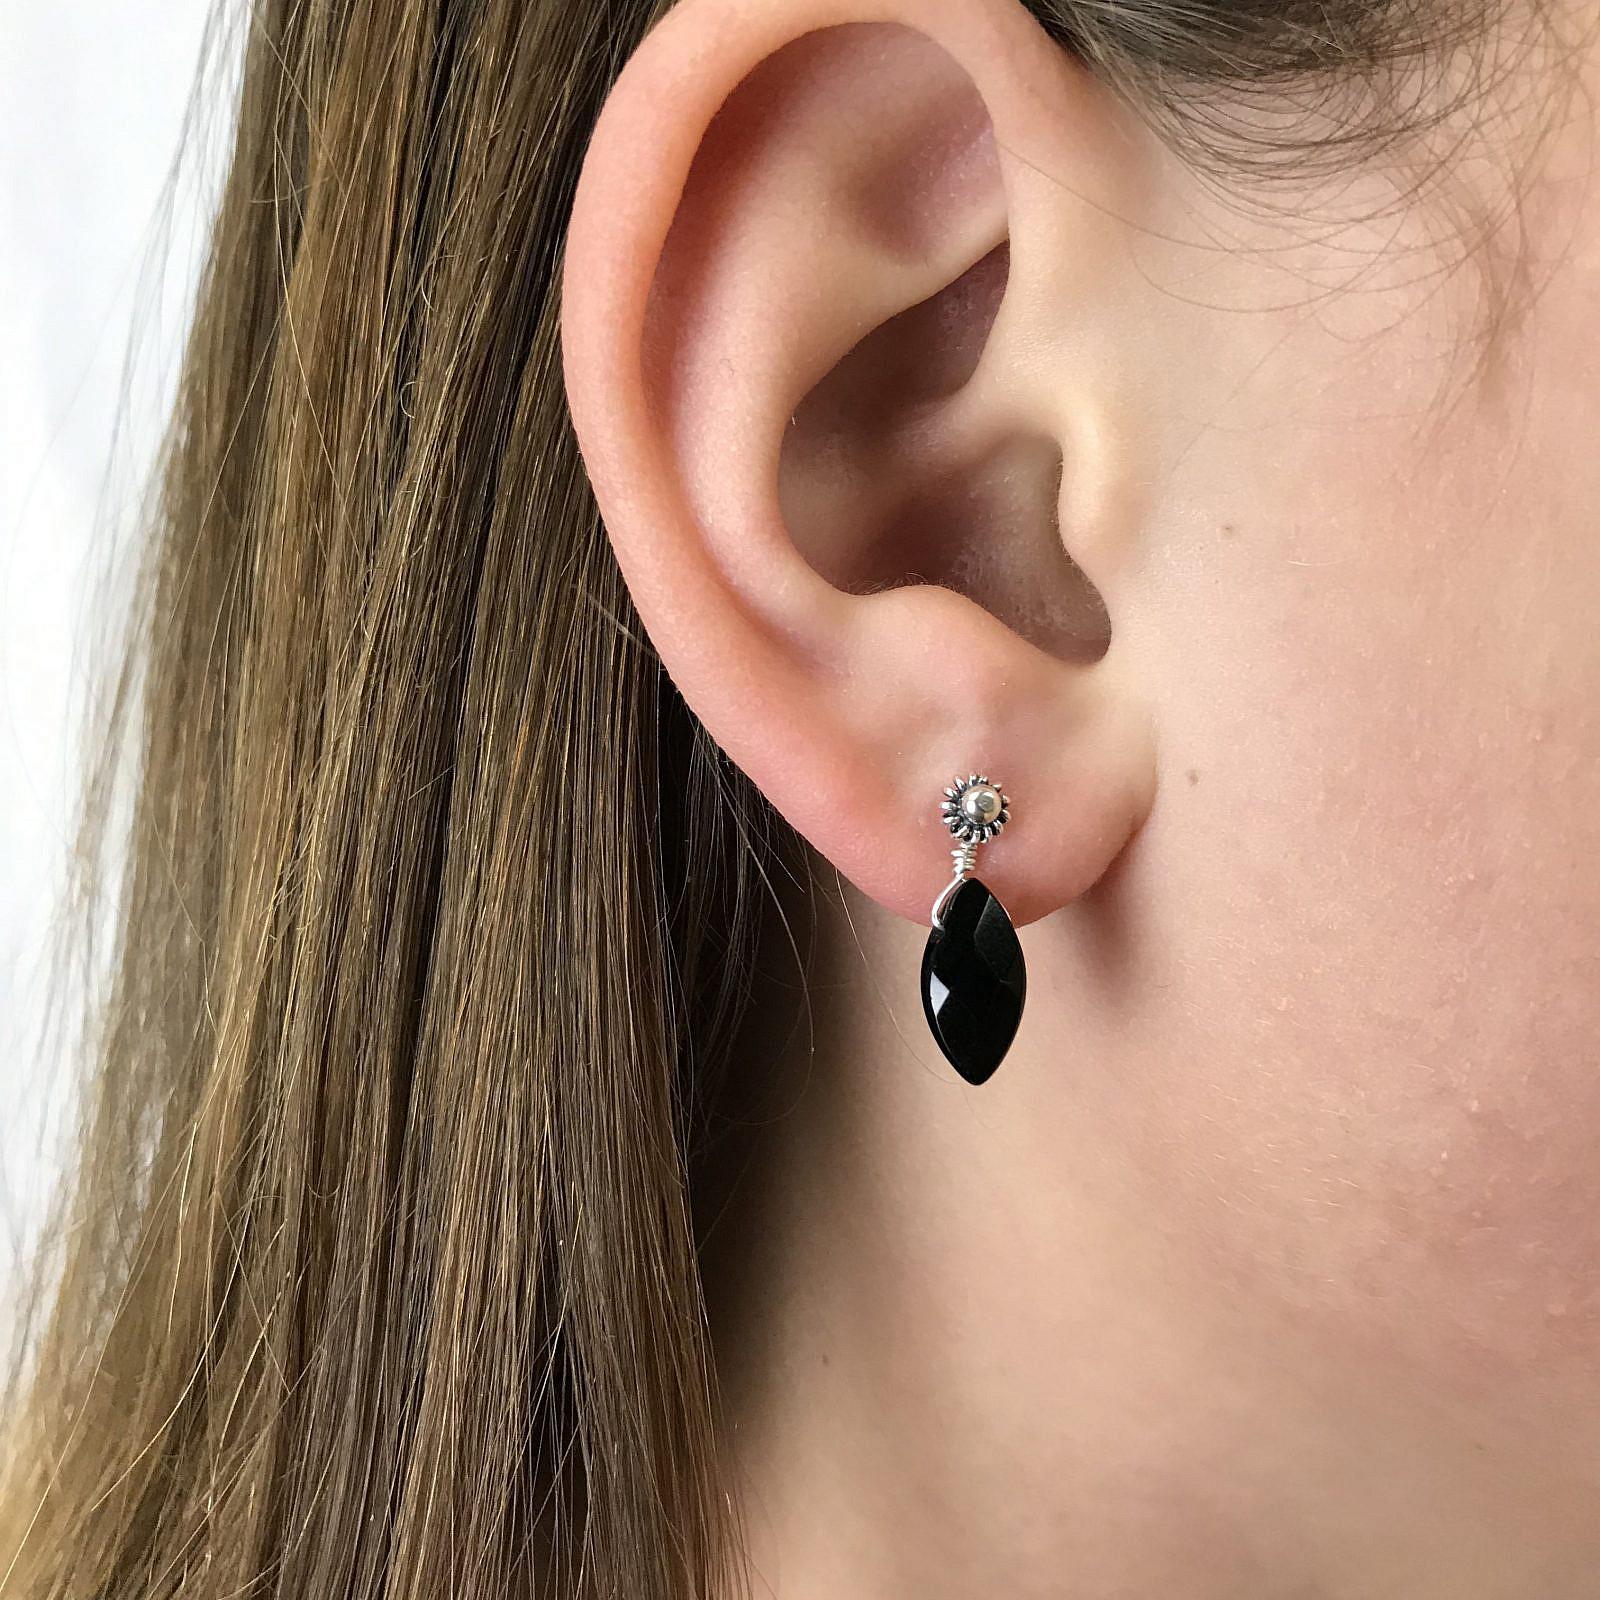 bronzite earrings gold post earrings Bronzite and gold wire wrapped stud earrings bronzite jewelry